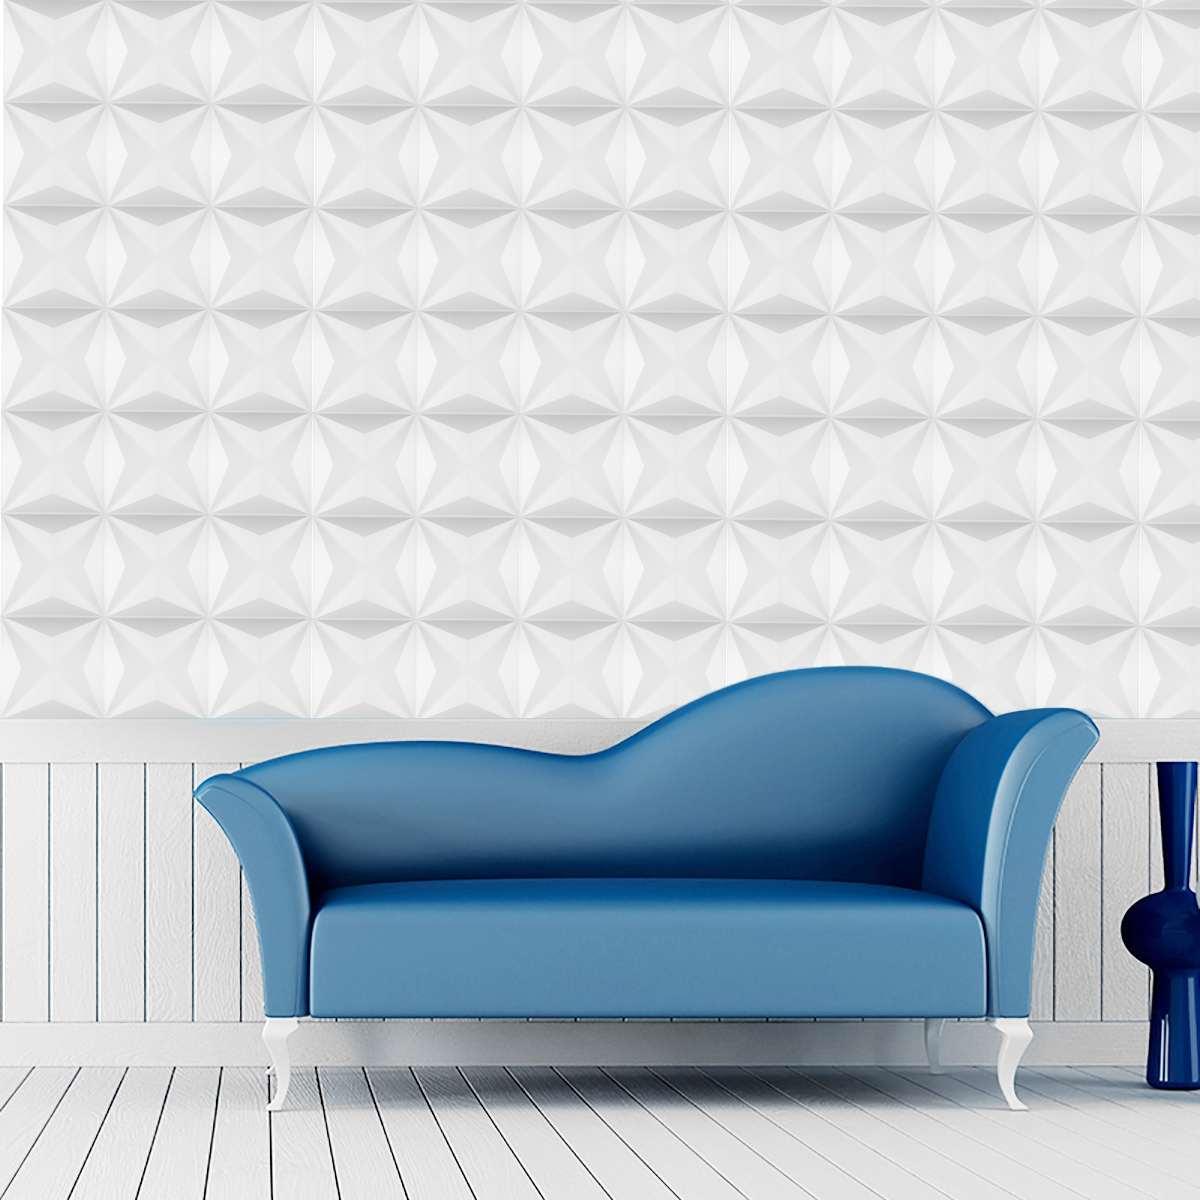 Thicking Waterproof Gold Silver Foil Wallpaper Hotel KTV Bars TV Backdrop 5.3㎡